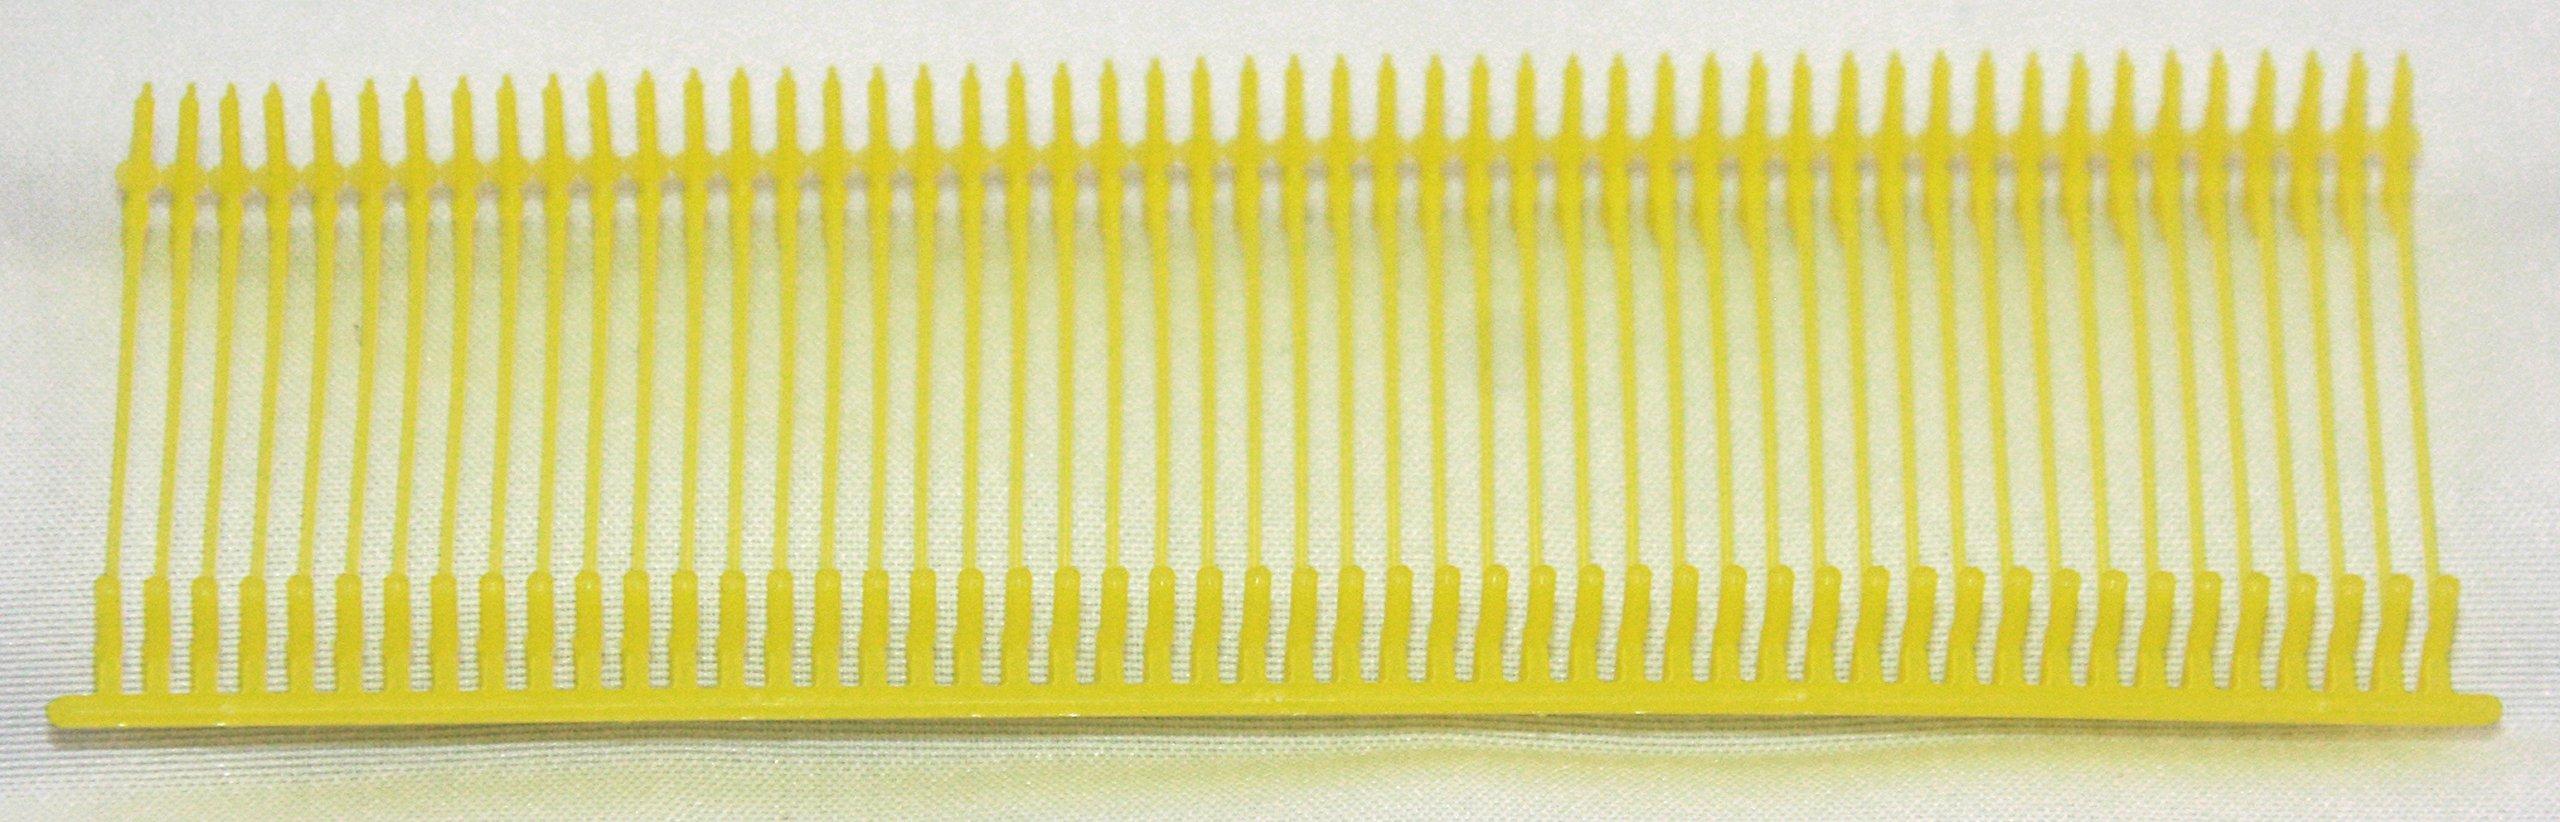 Amram Standard Tagging Attachments 1'', 50/Clip, 5,000/box, Yellow